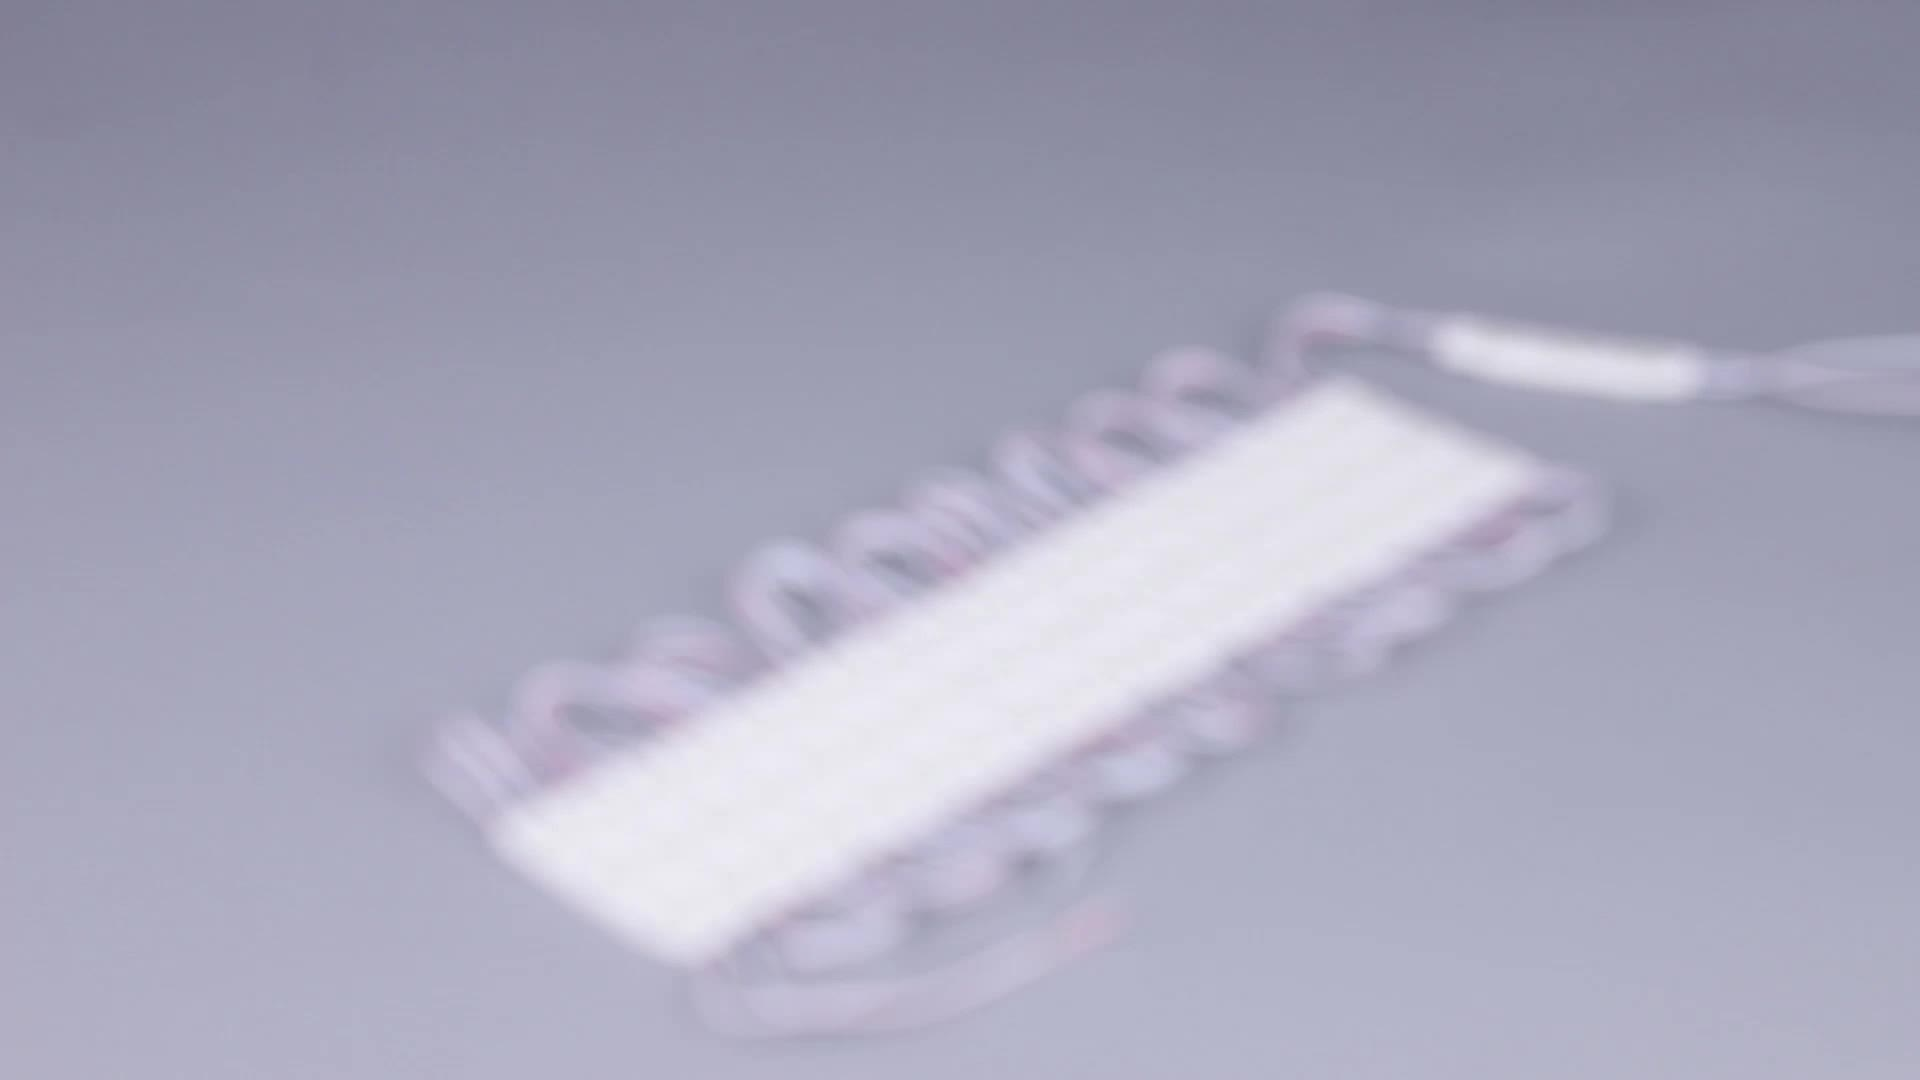 Waterproof ip66 smd 2835 high efficient led module 12v